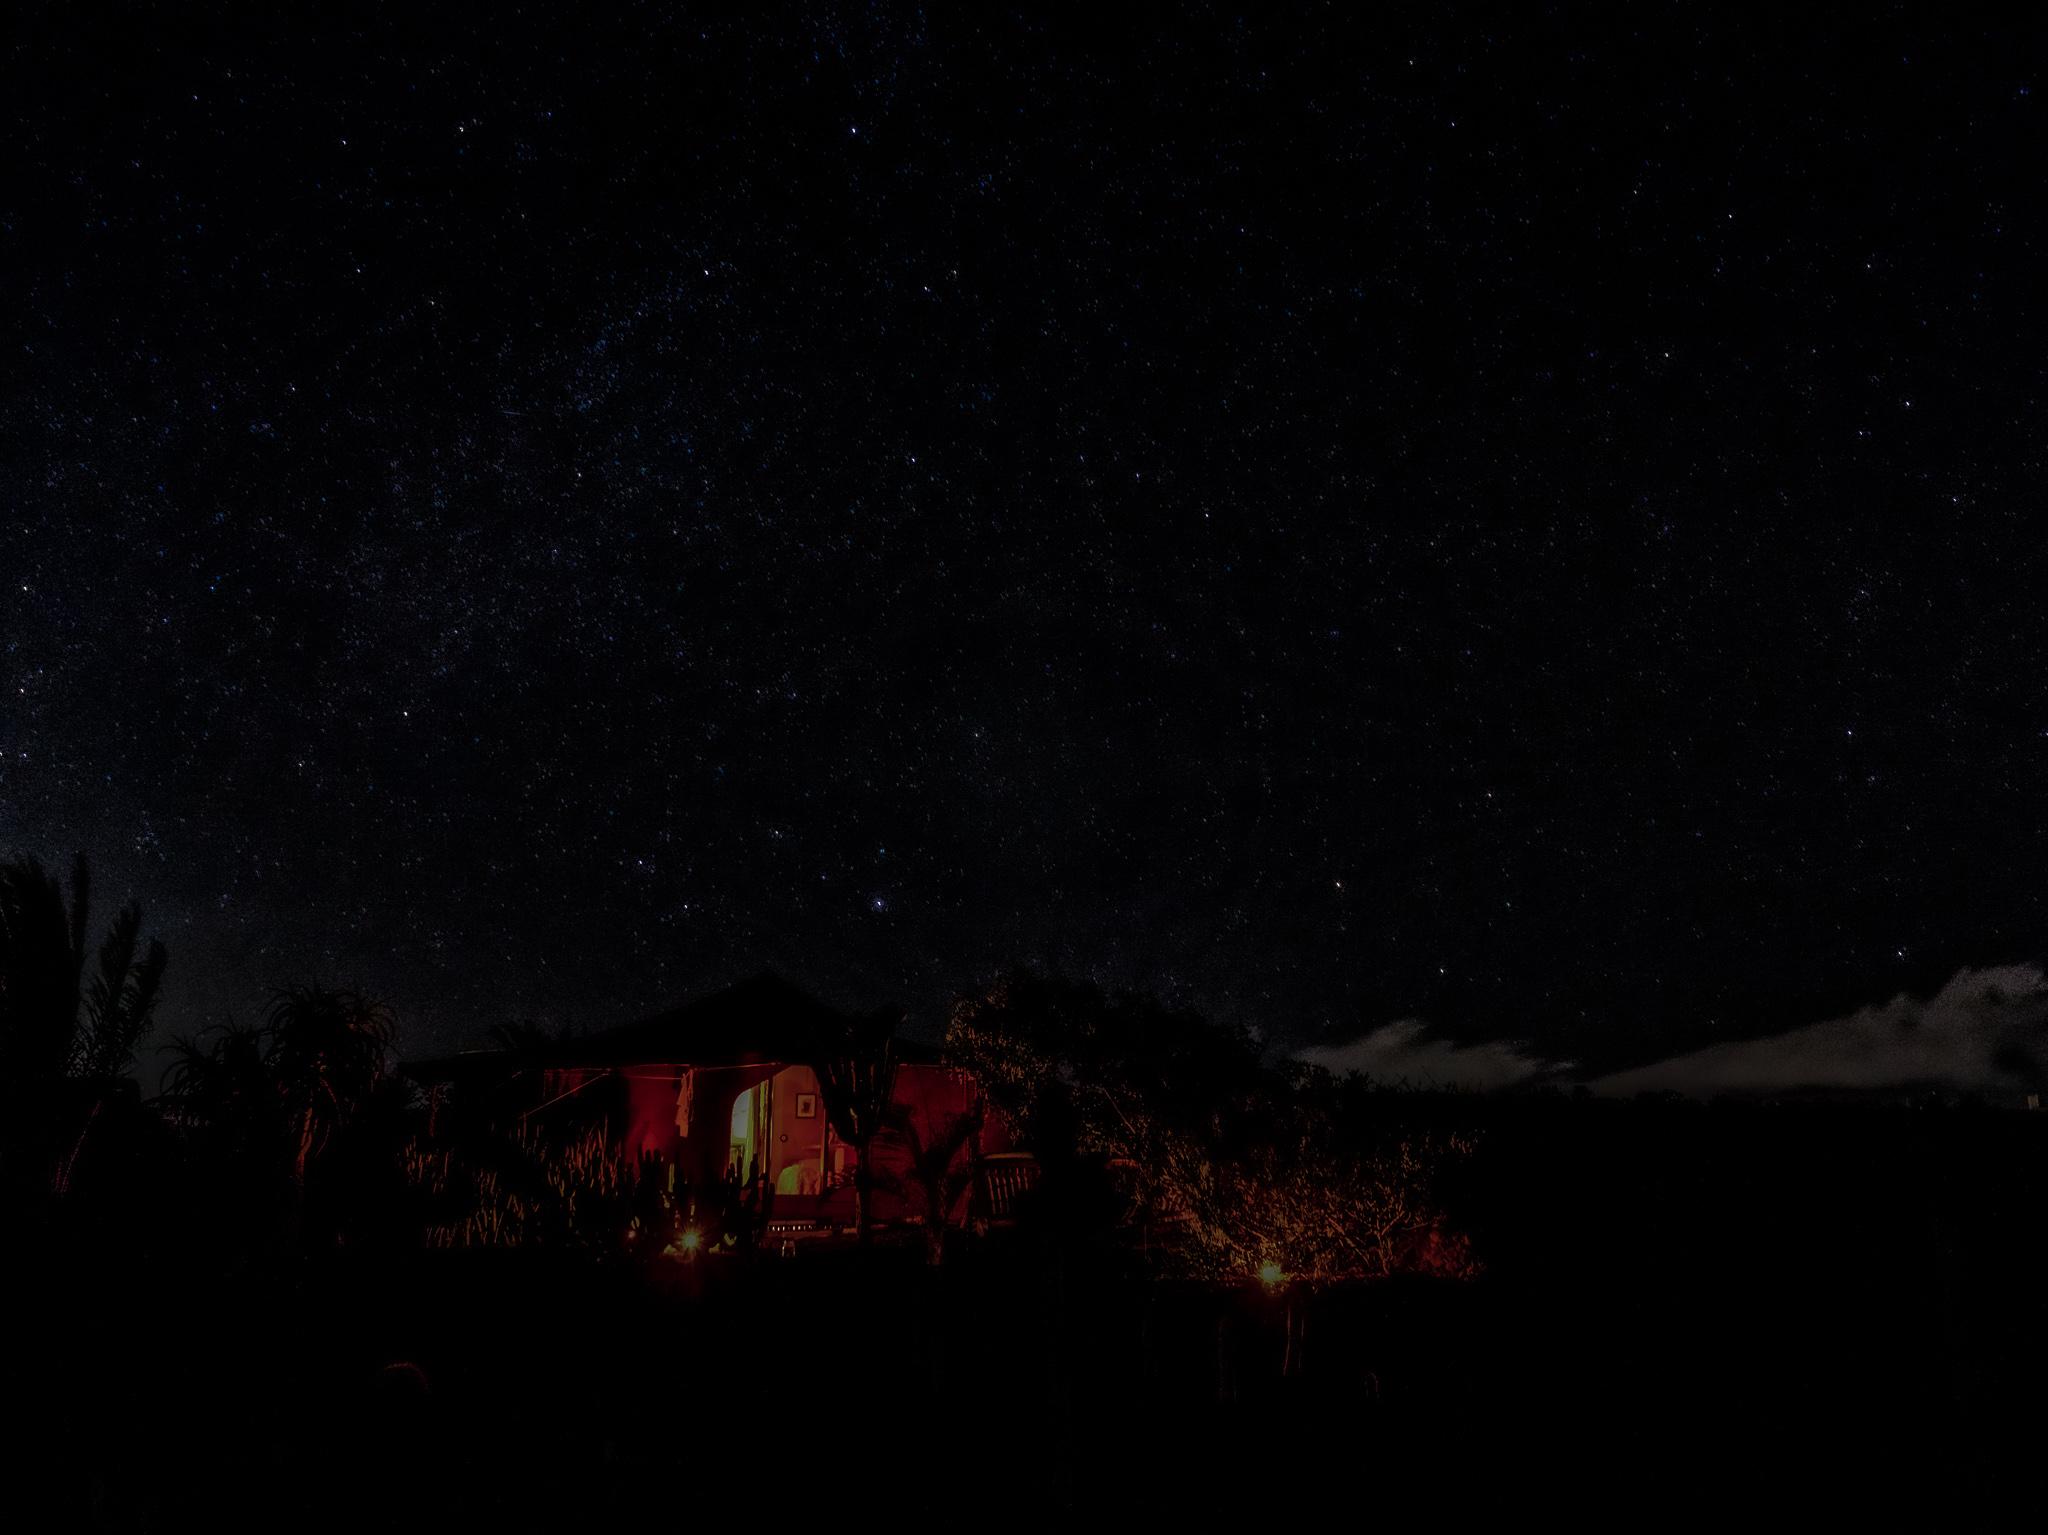 P1622551 aimaTeseguite Nacht 1